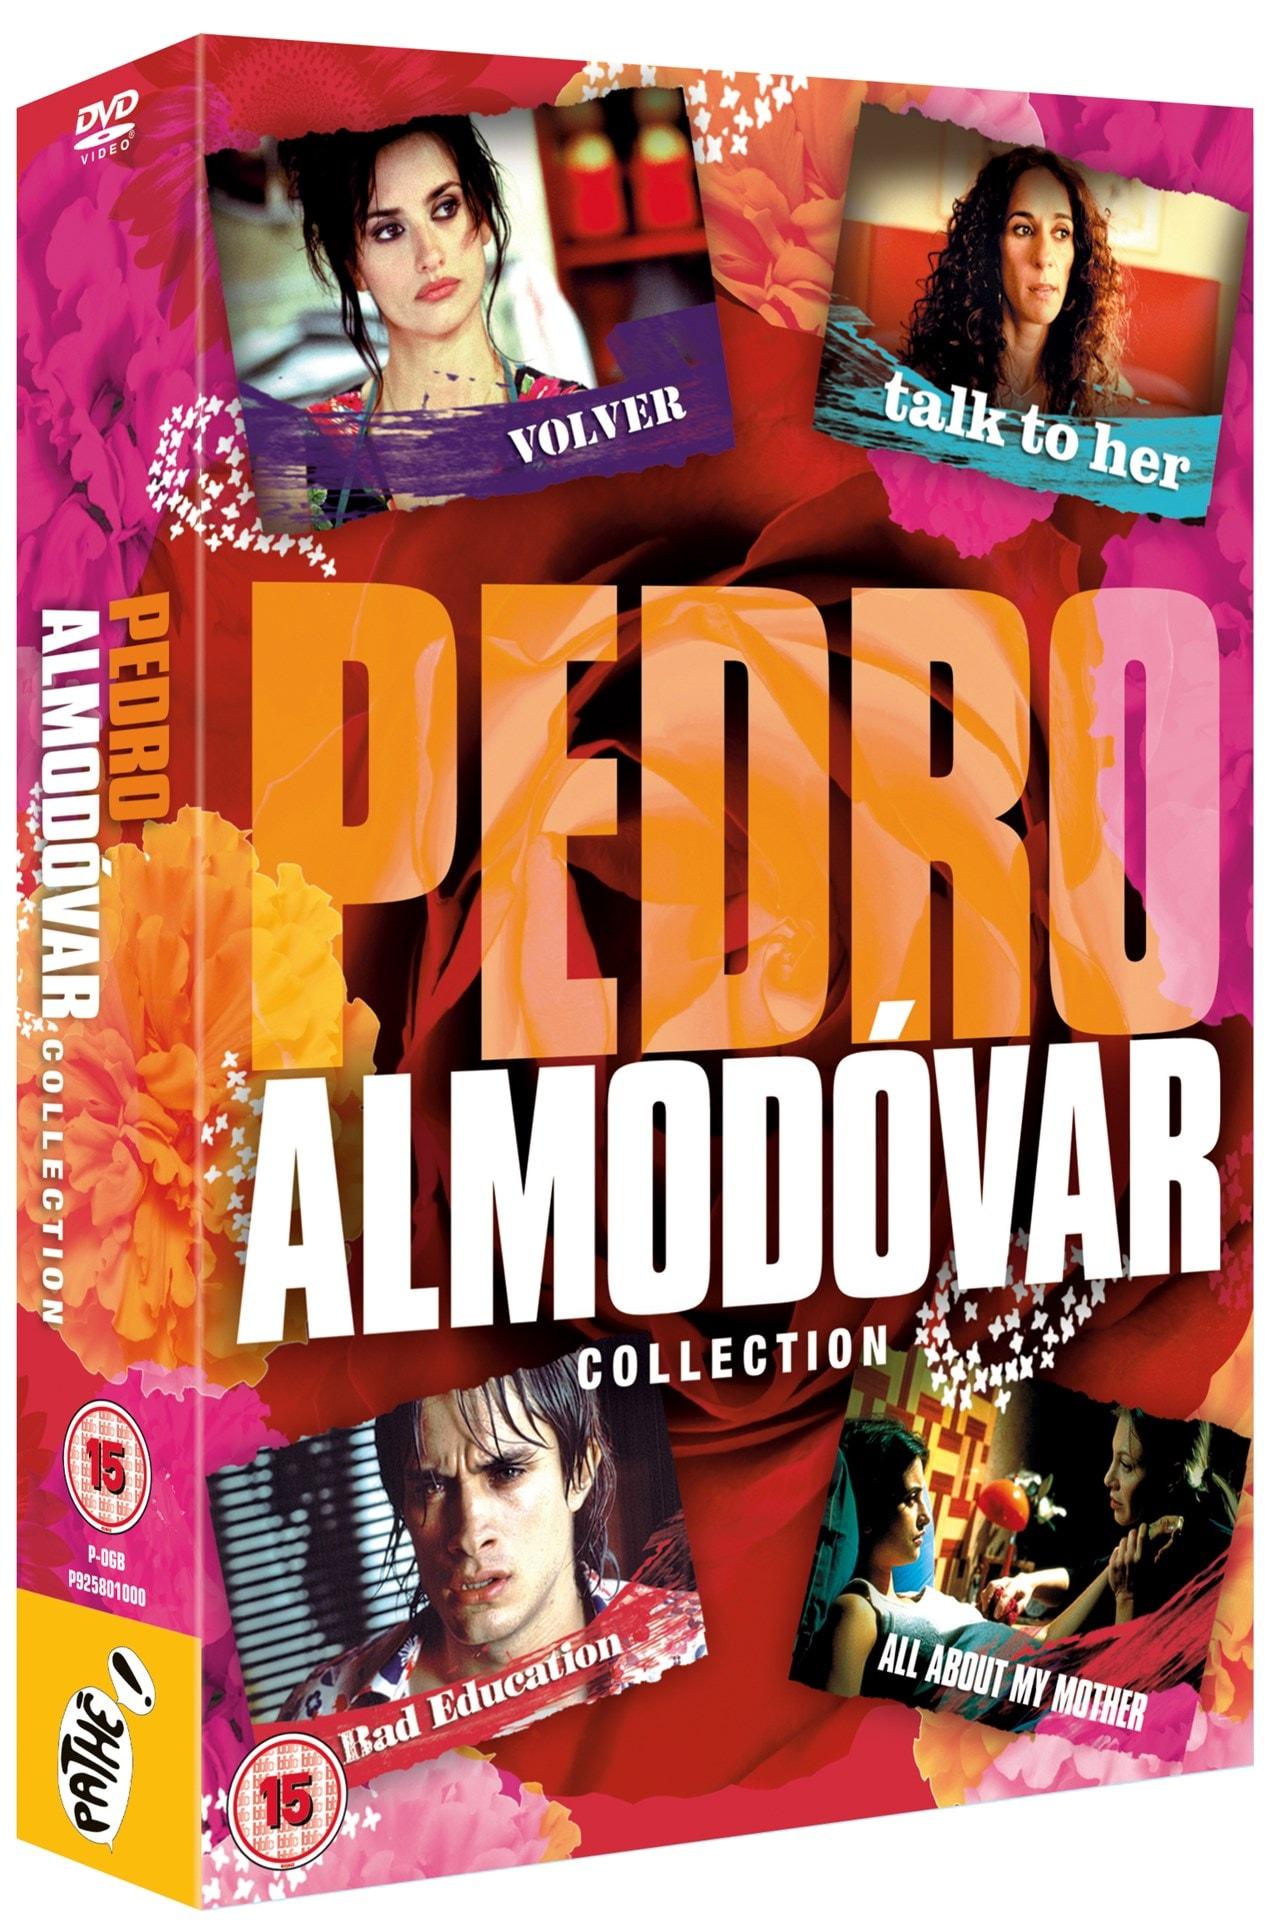 Pedro Almodovar Collection - 2